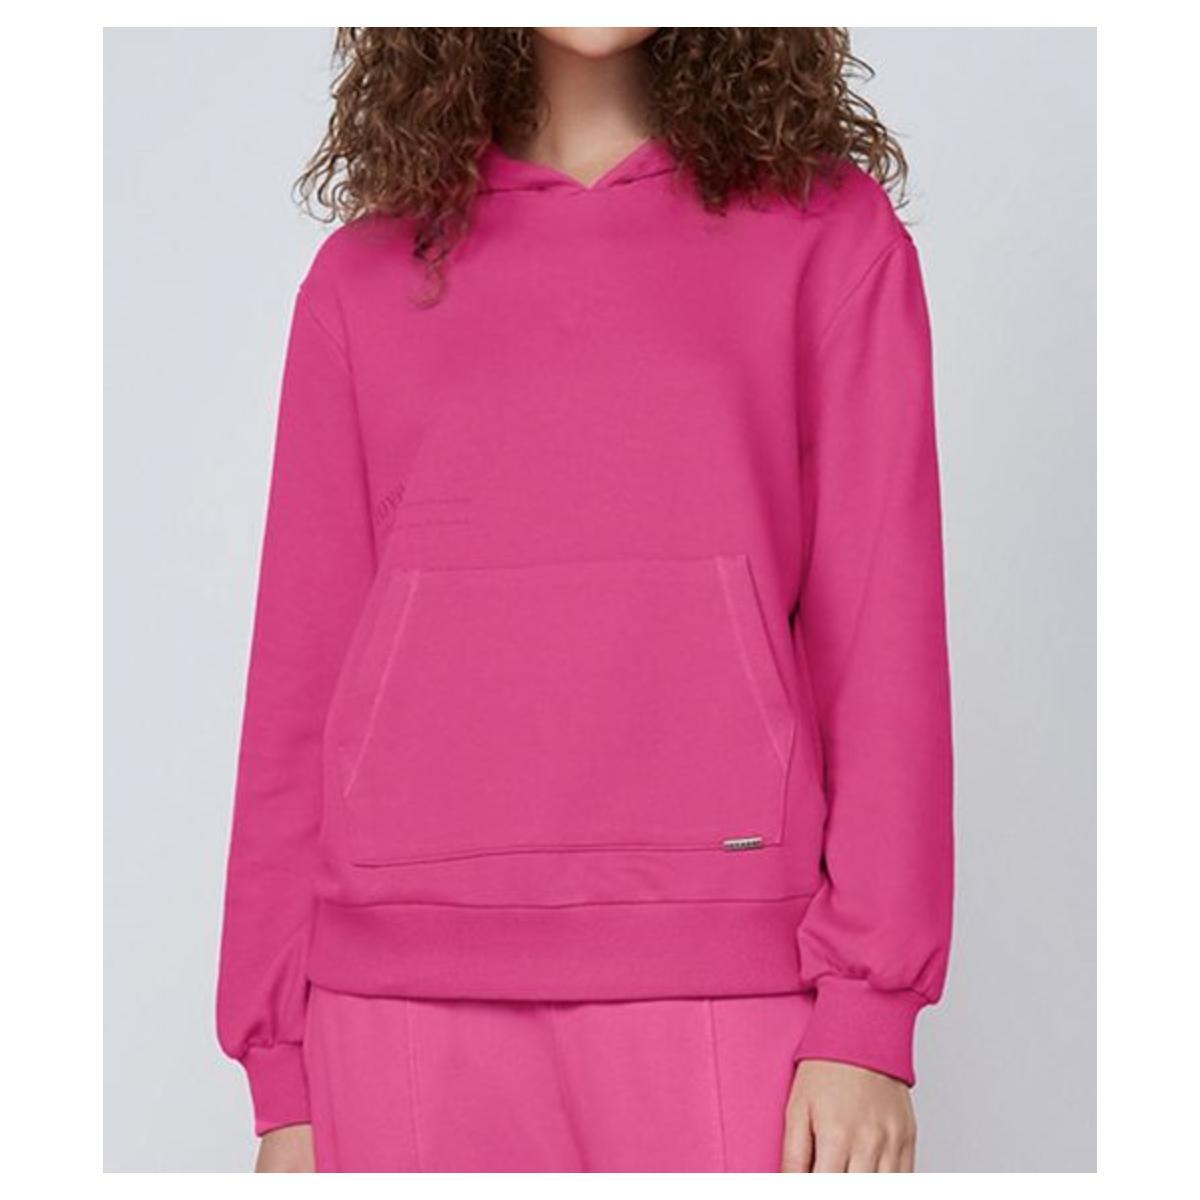 Blusão Feminino Dzarm 6lfr Kr2en Pink